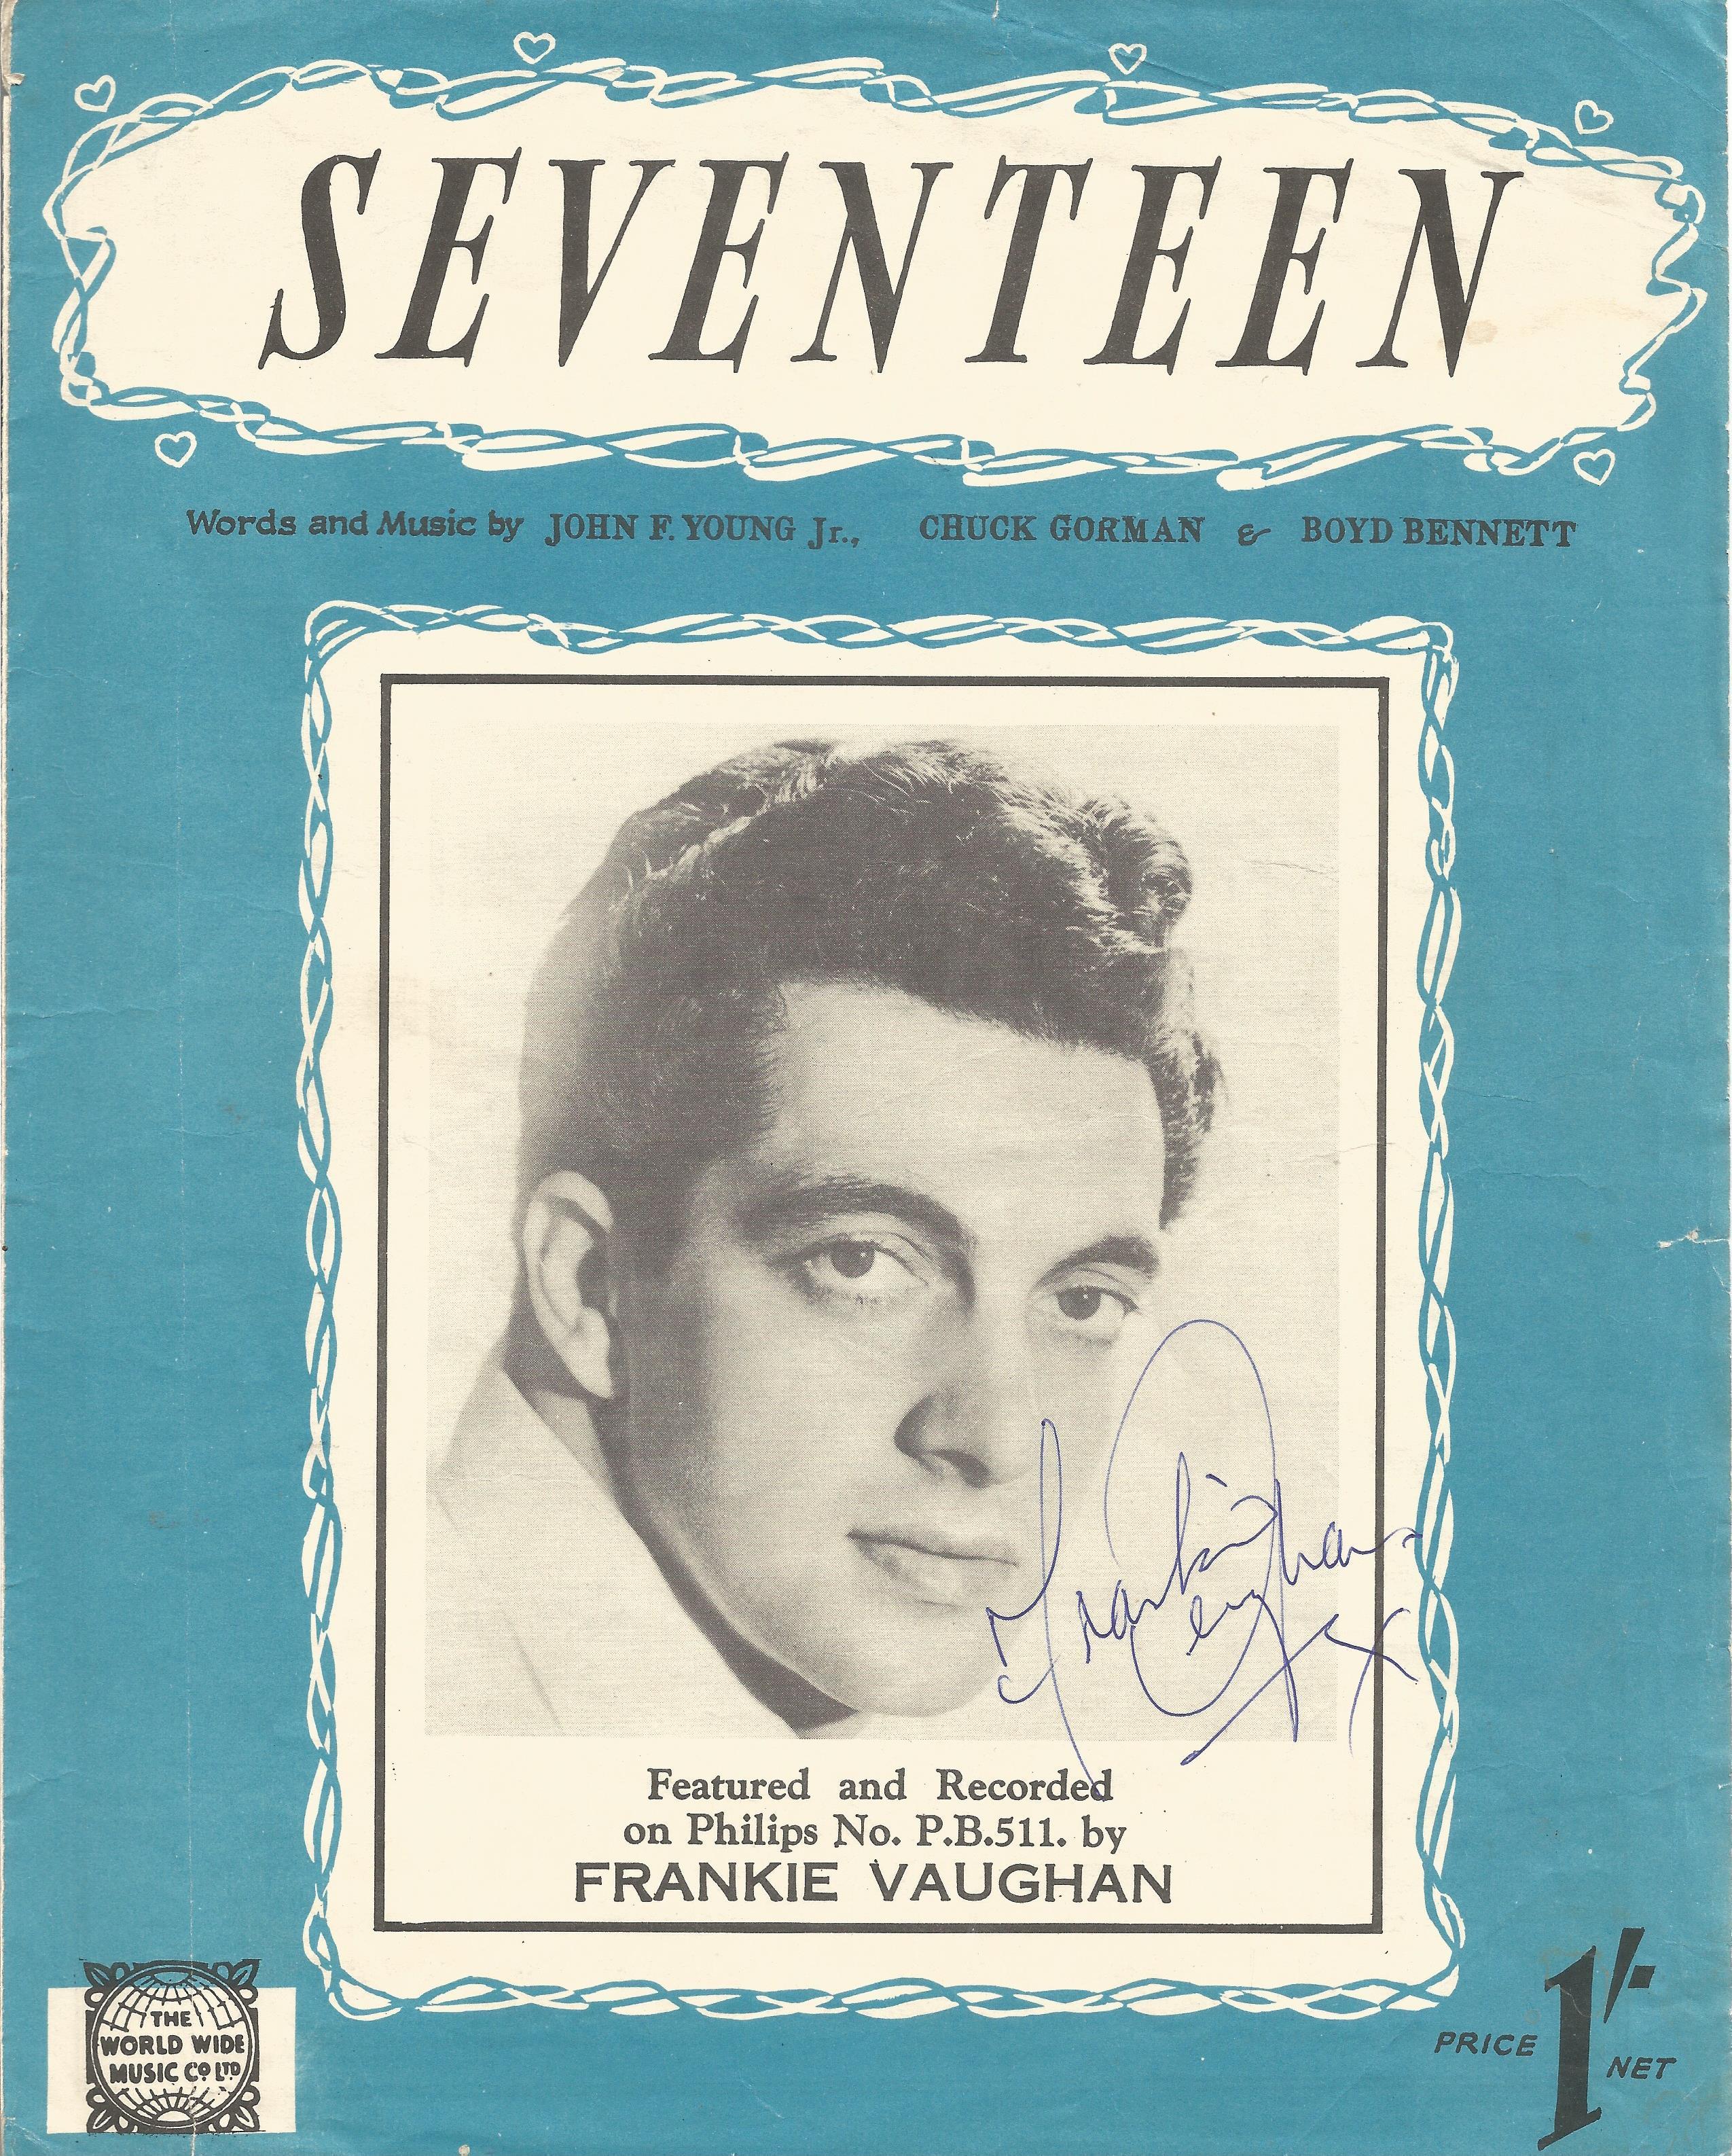 Frankie Vaughan 1928 1999 Singer Signed 1955 Vintage 'Seventeen' Sheet Music. Good condition. All